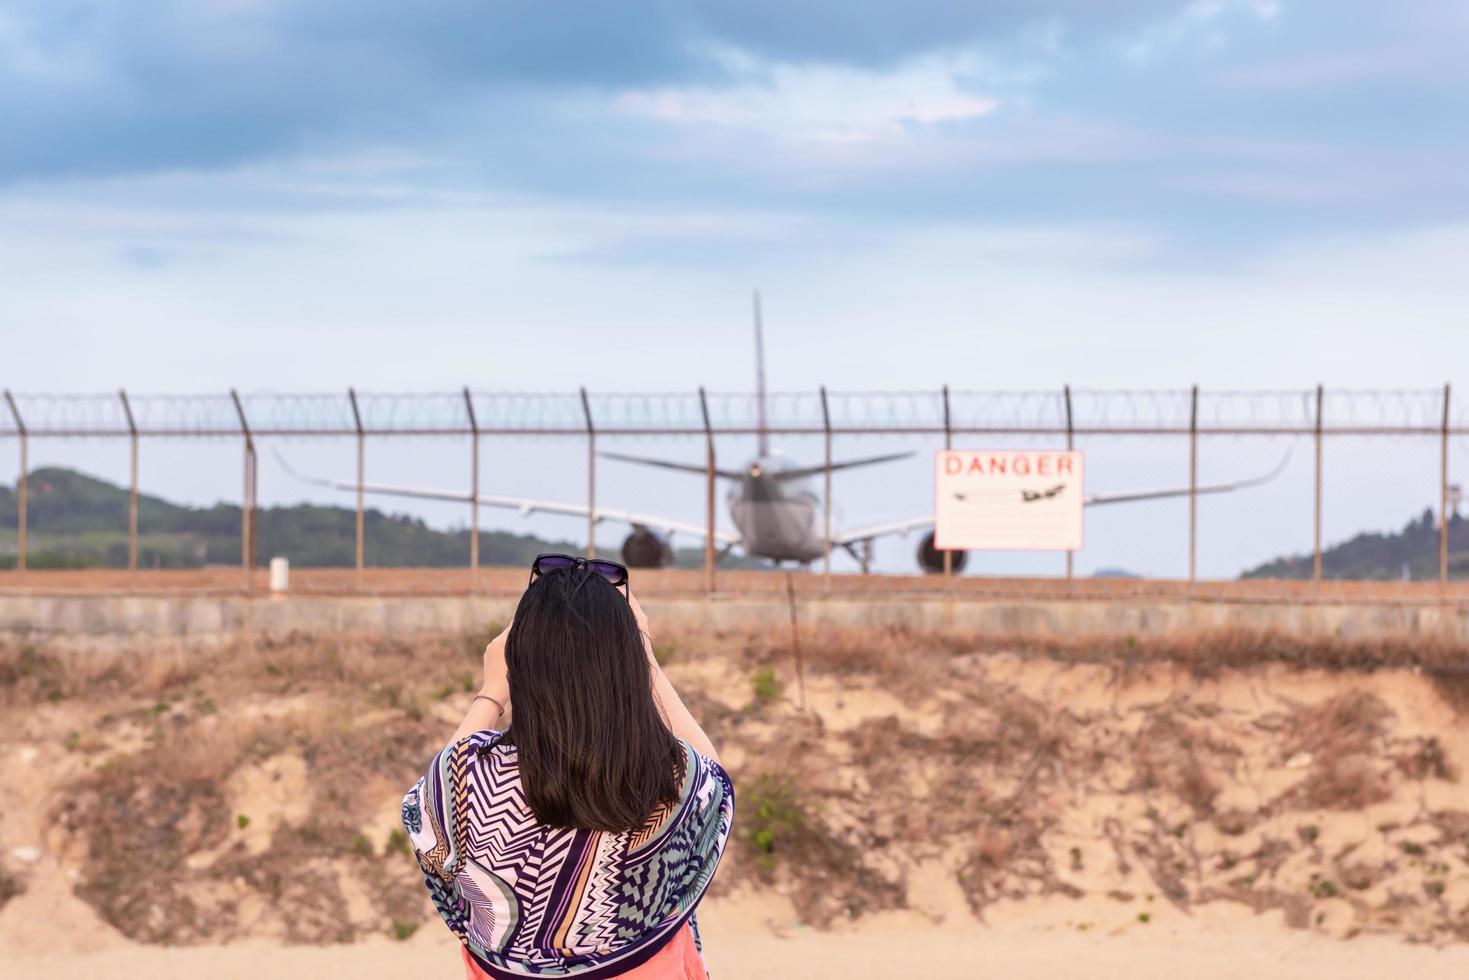 vrouw fotograferen vliegtuig foto